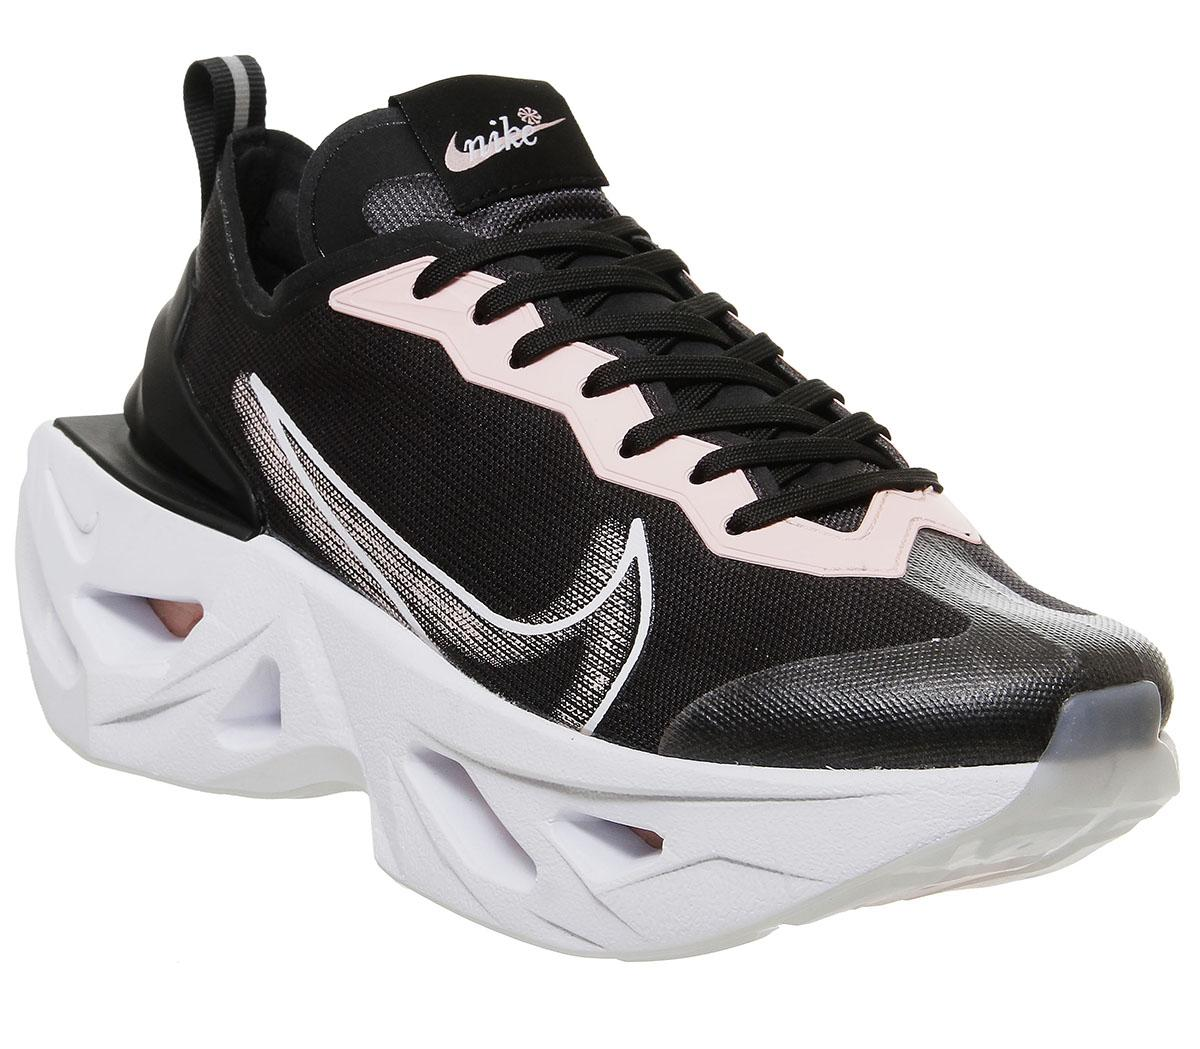 Nike Zoom X Vista Grind Trainers